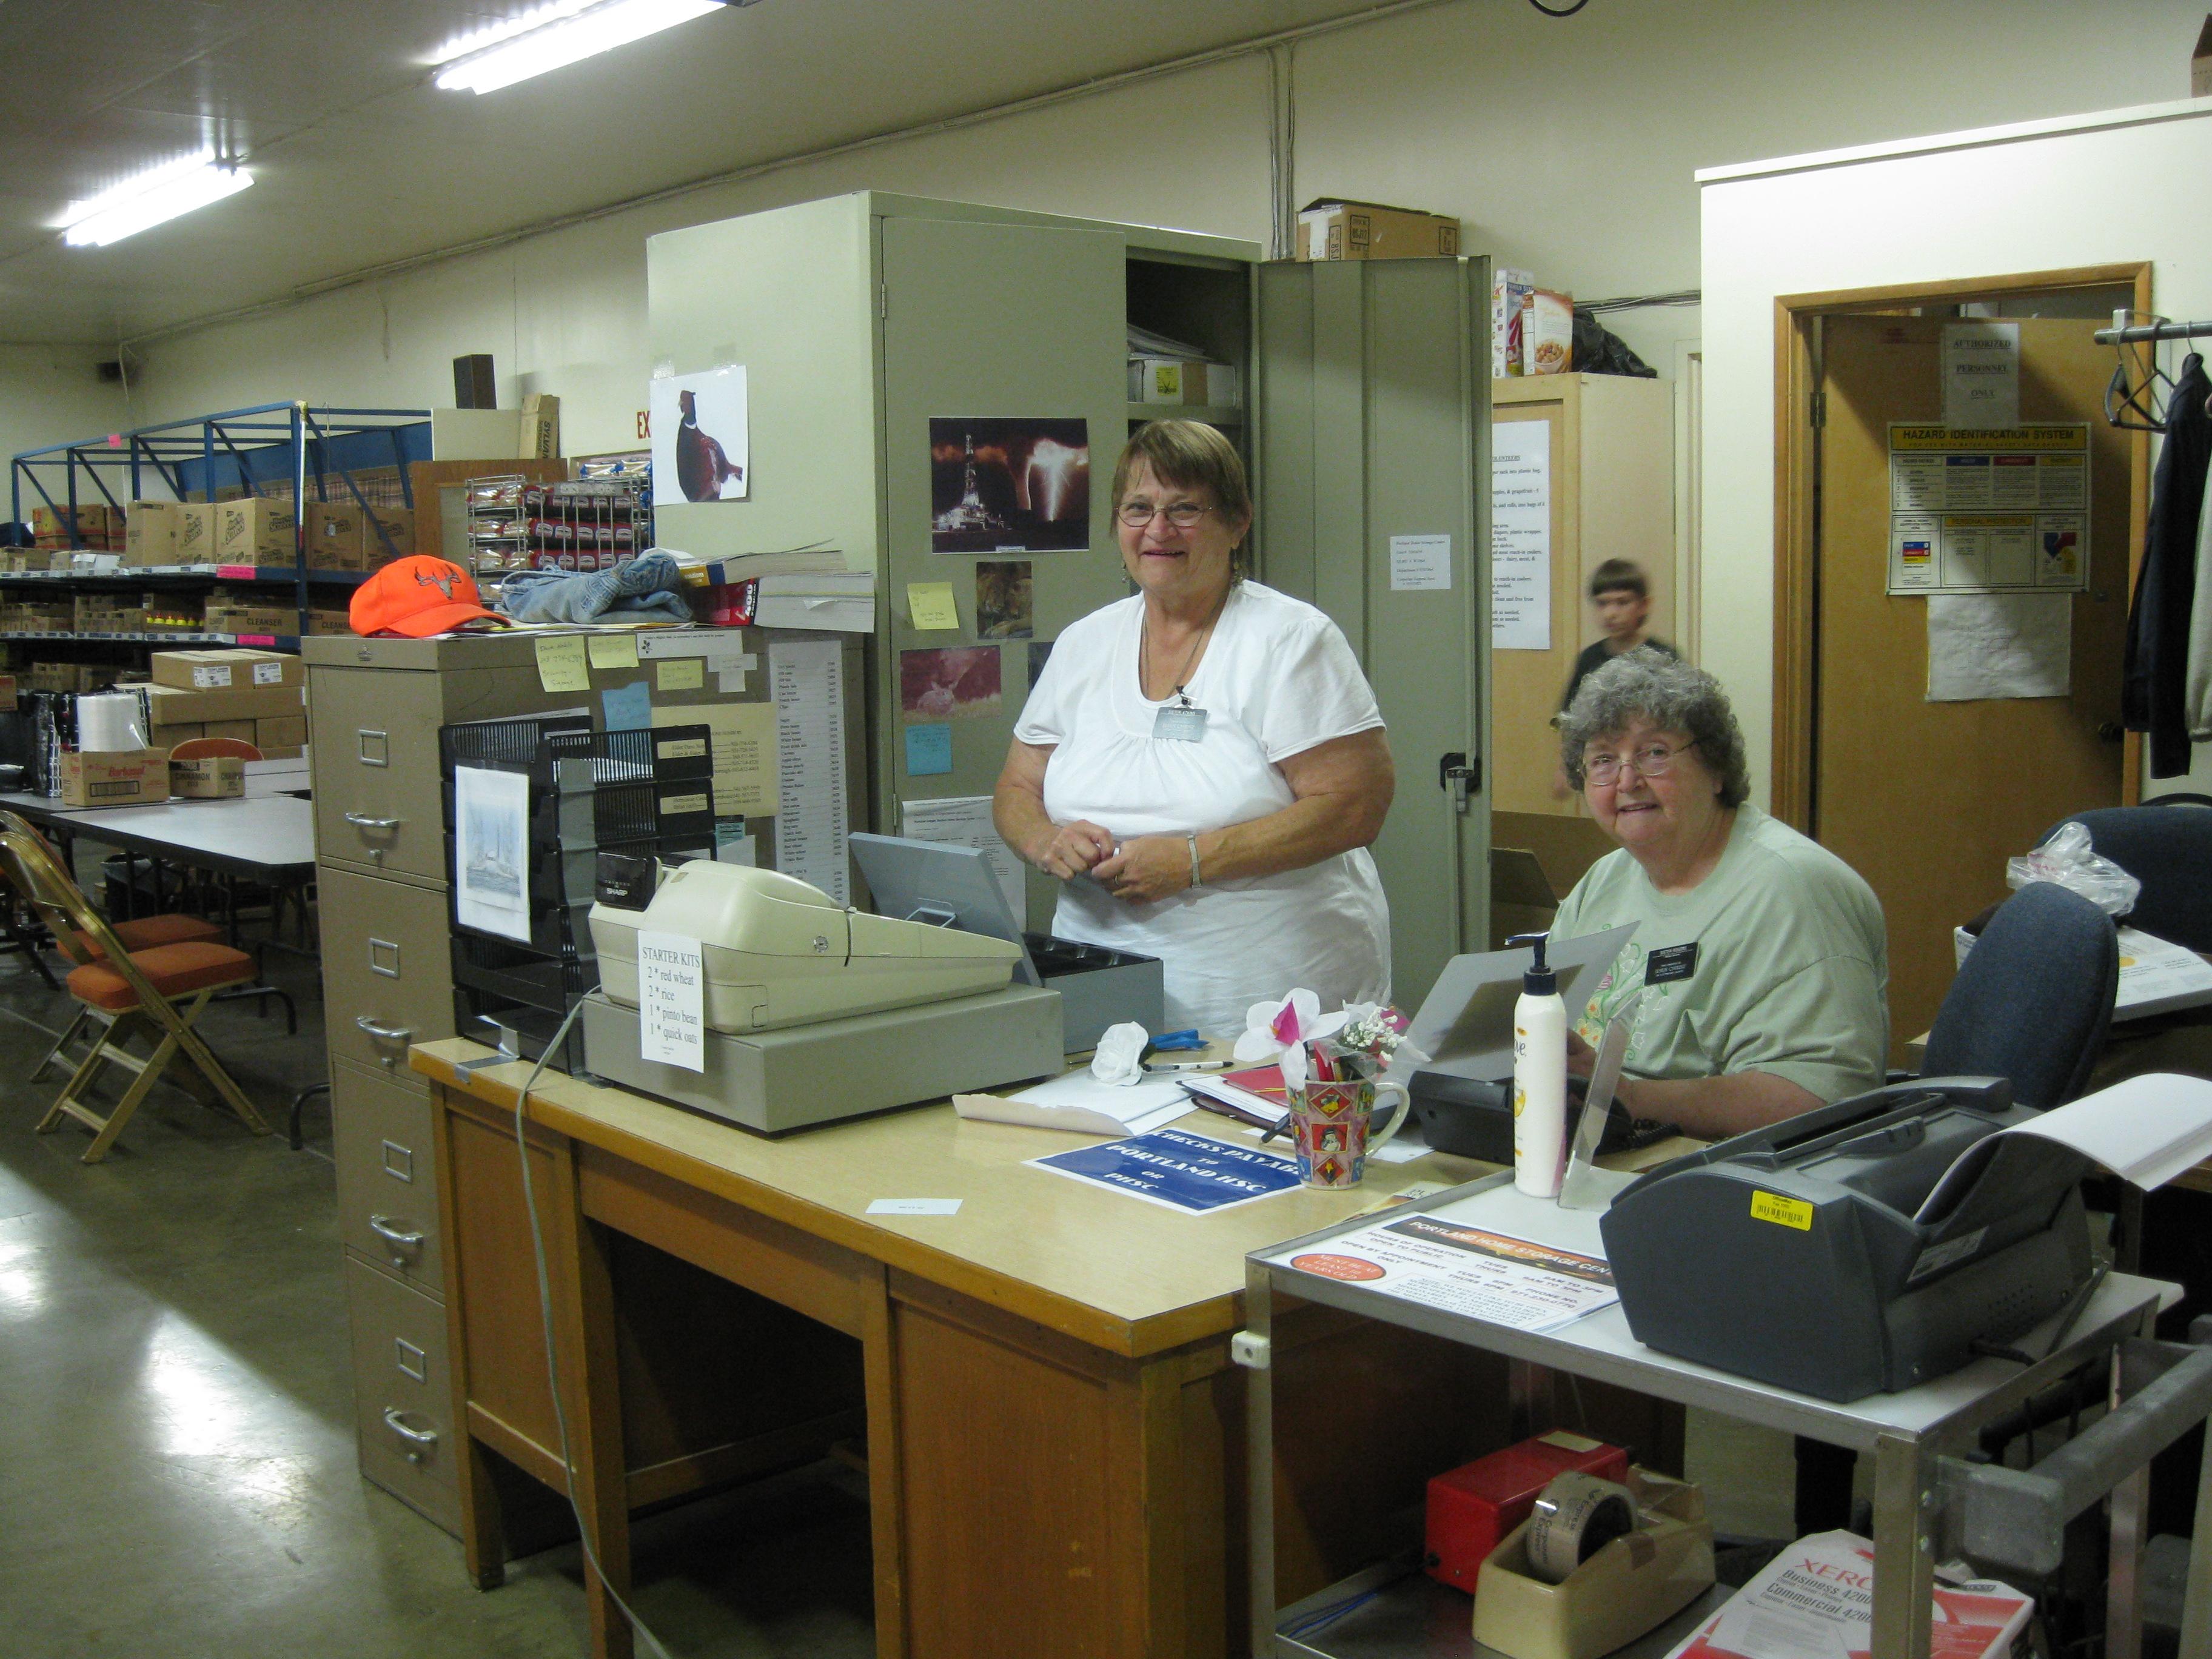 LDS Distribution Center